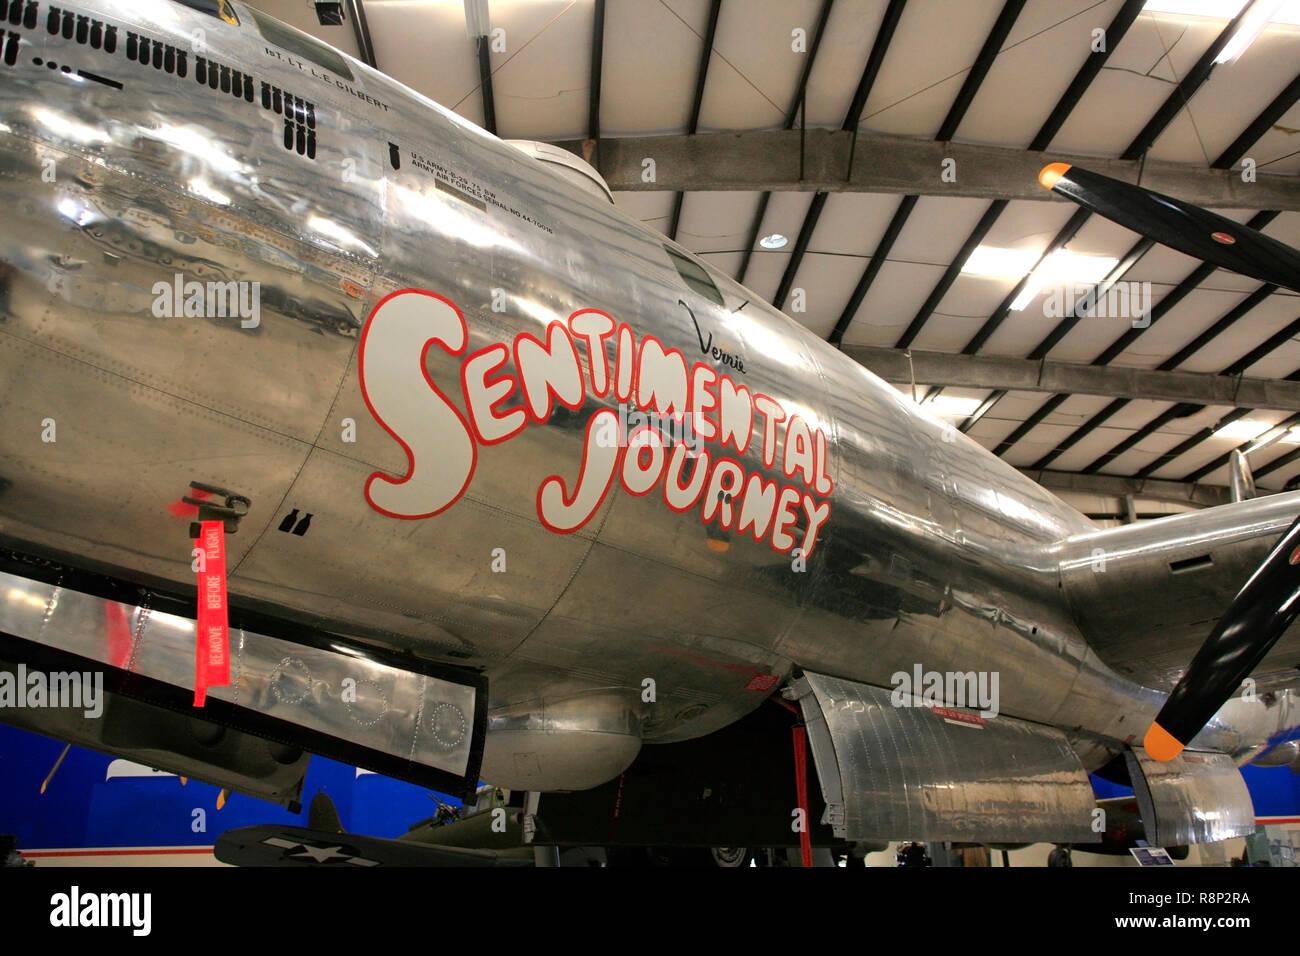 WW2 Boeing B29 Superfortress 'SENTIMENTAL Journey' en la pantalla en el Pima Air & Space Museum de Tucson, AZ Foto de stock